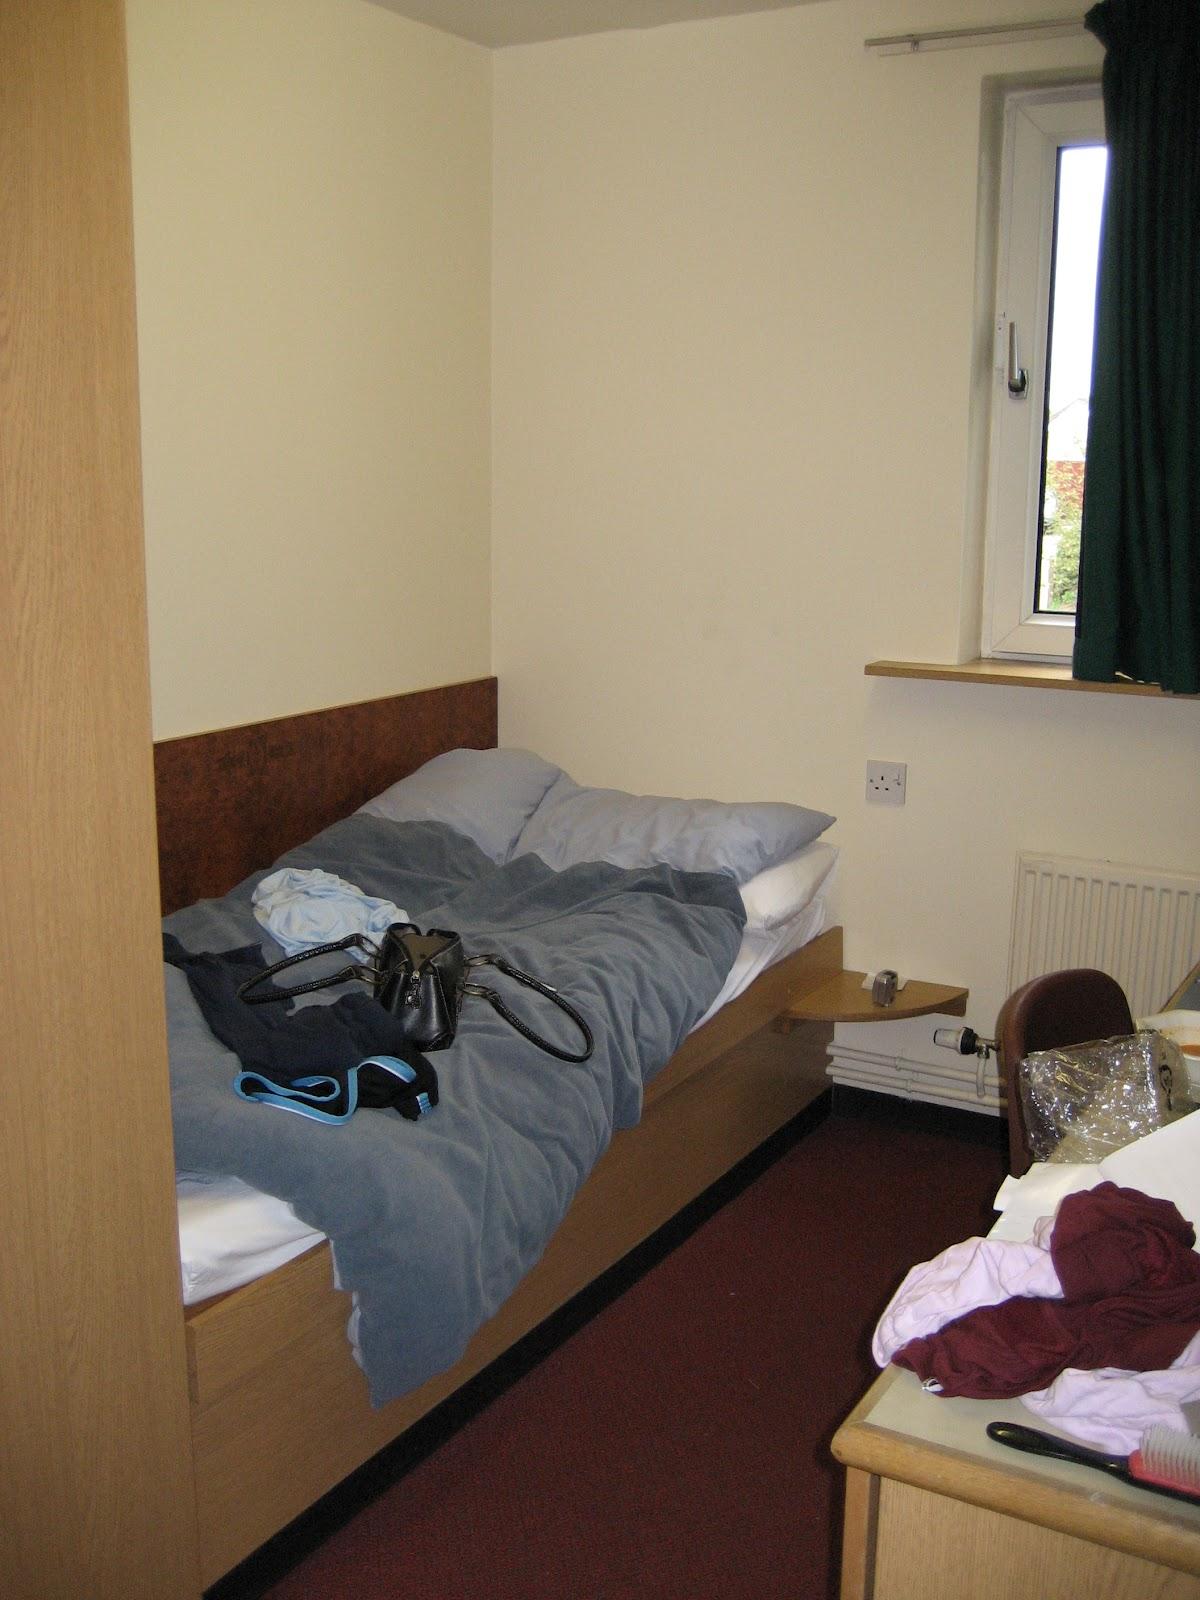 Landing Shortly A Peek Inside A Uea Dorm Room